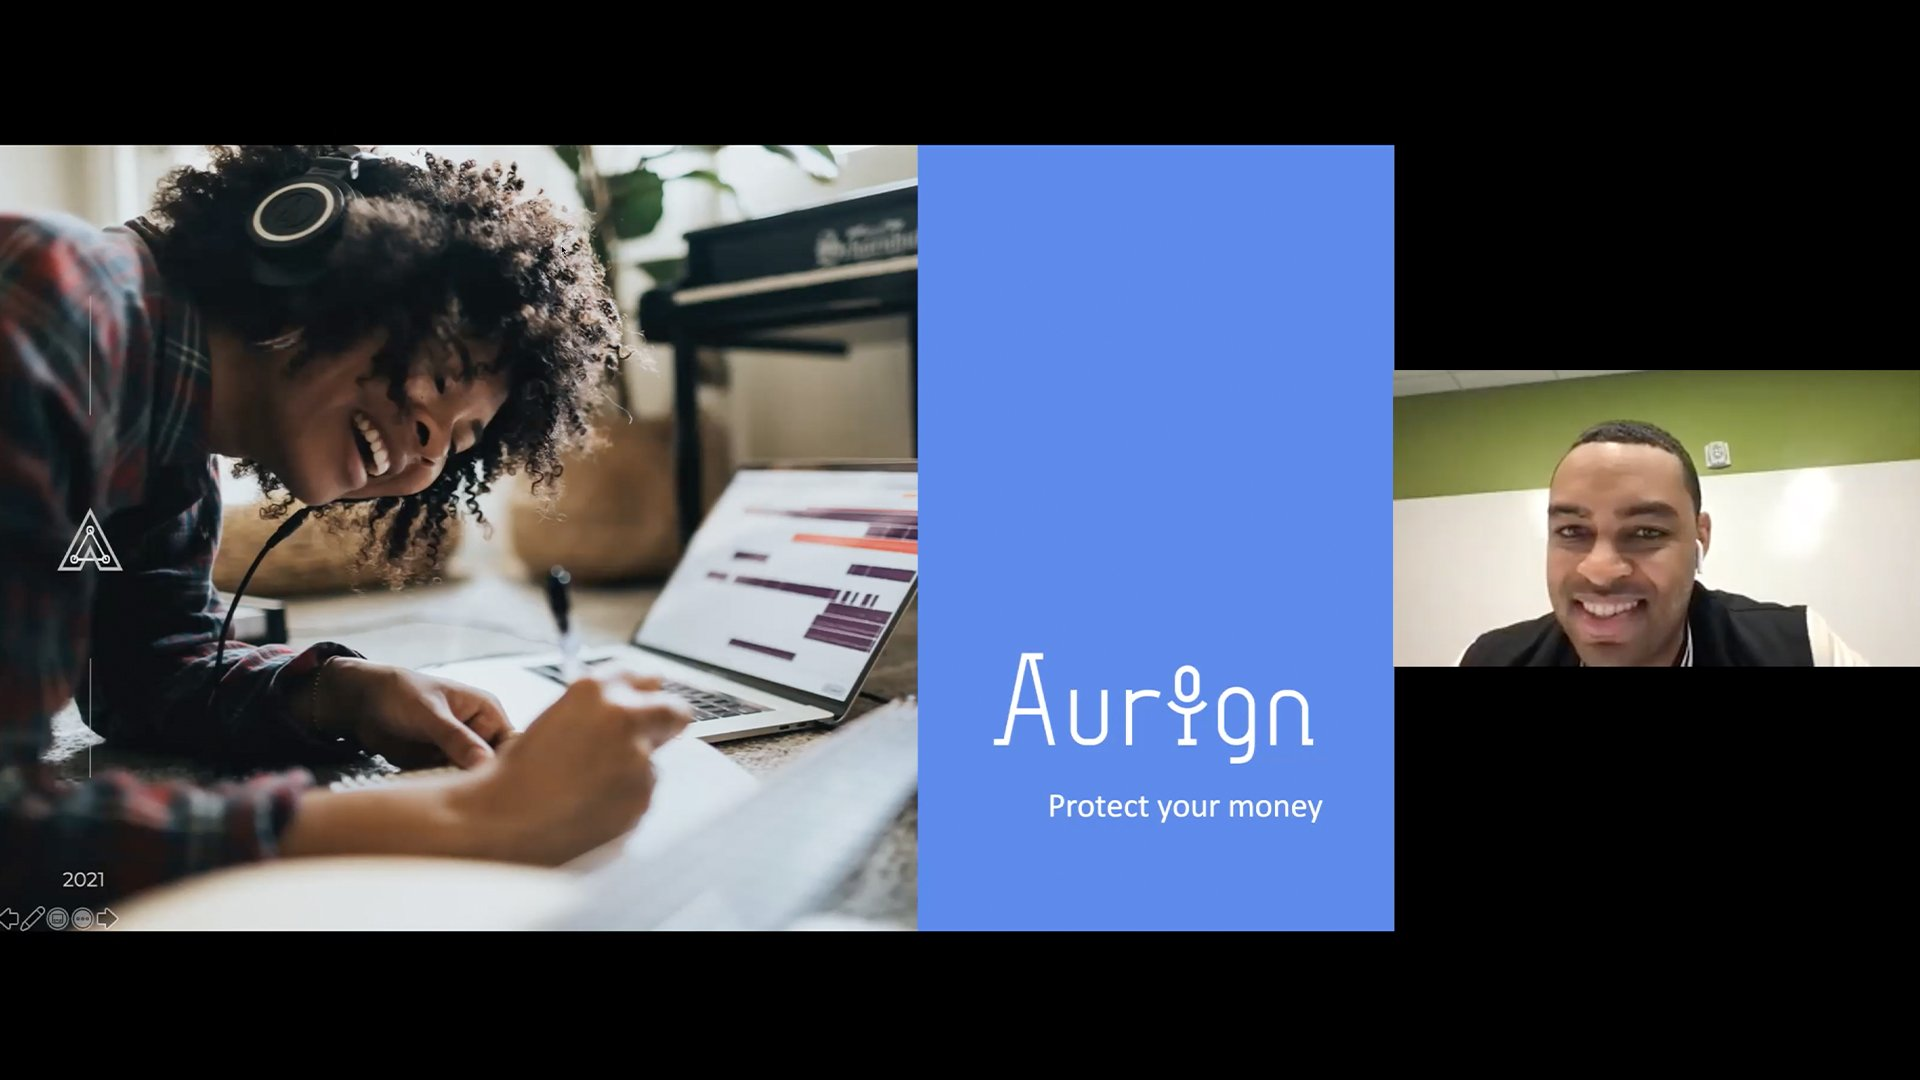 Aurign